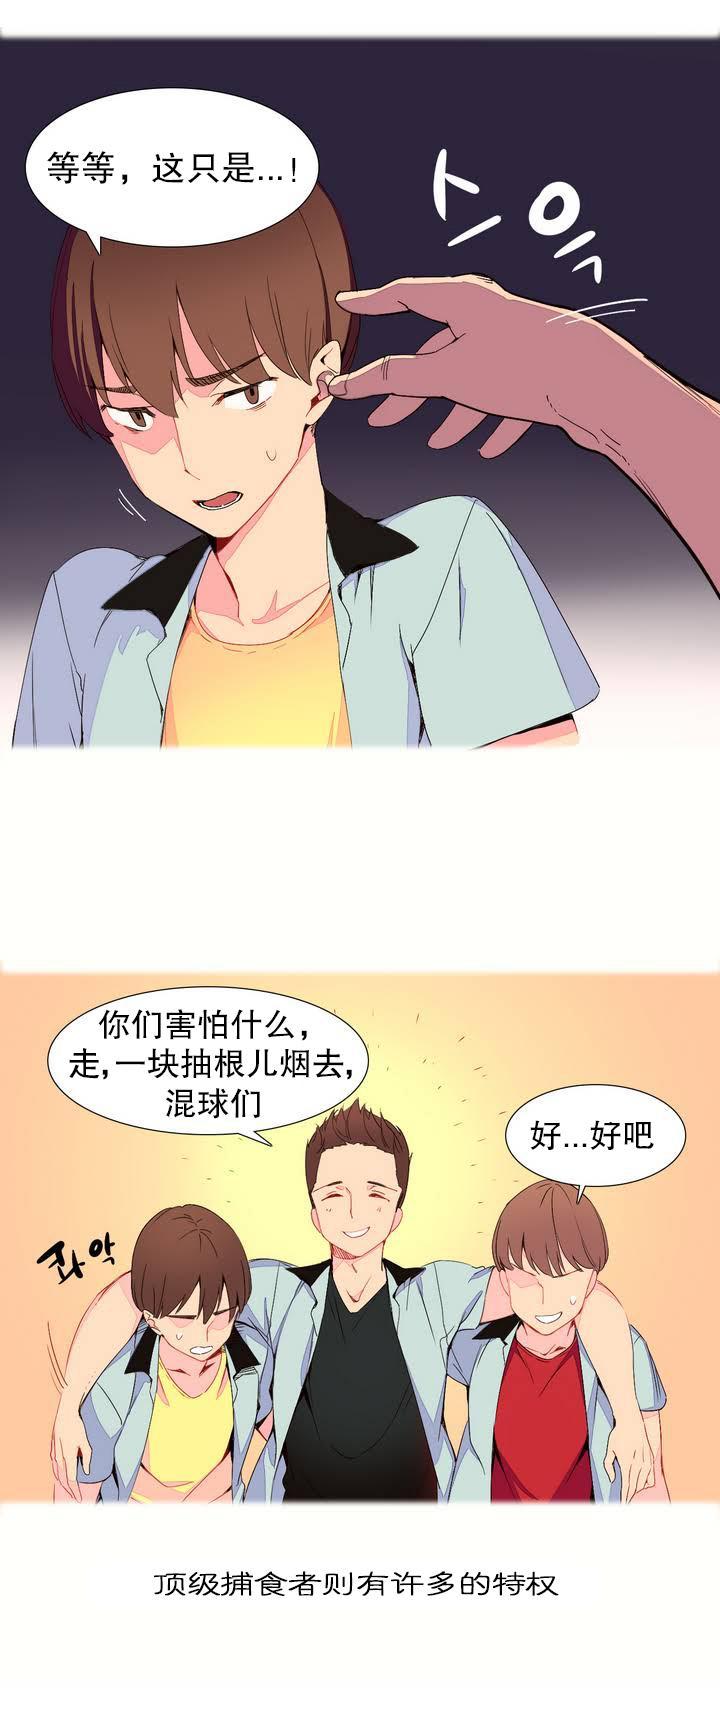 [Rozer] 一个由我统治的世界(A World that I Rule) Ch.1-3 [Chinese] 10